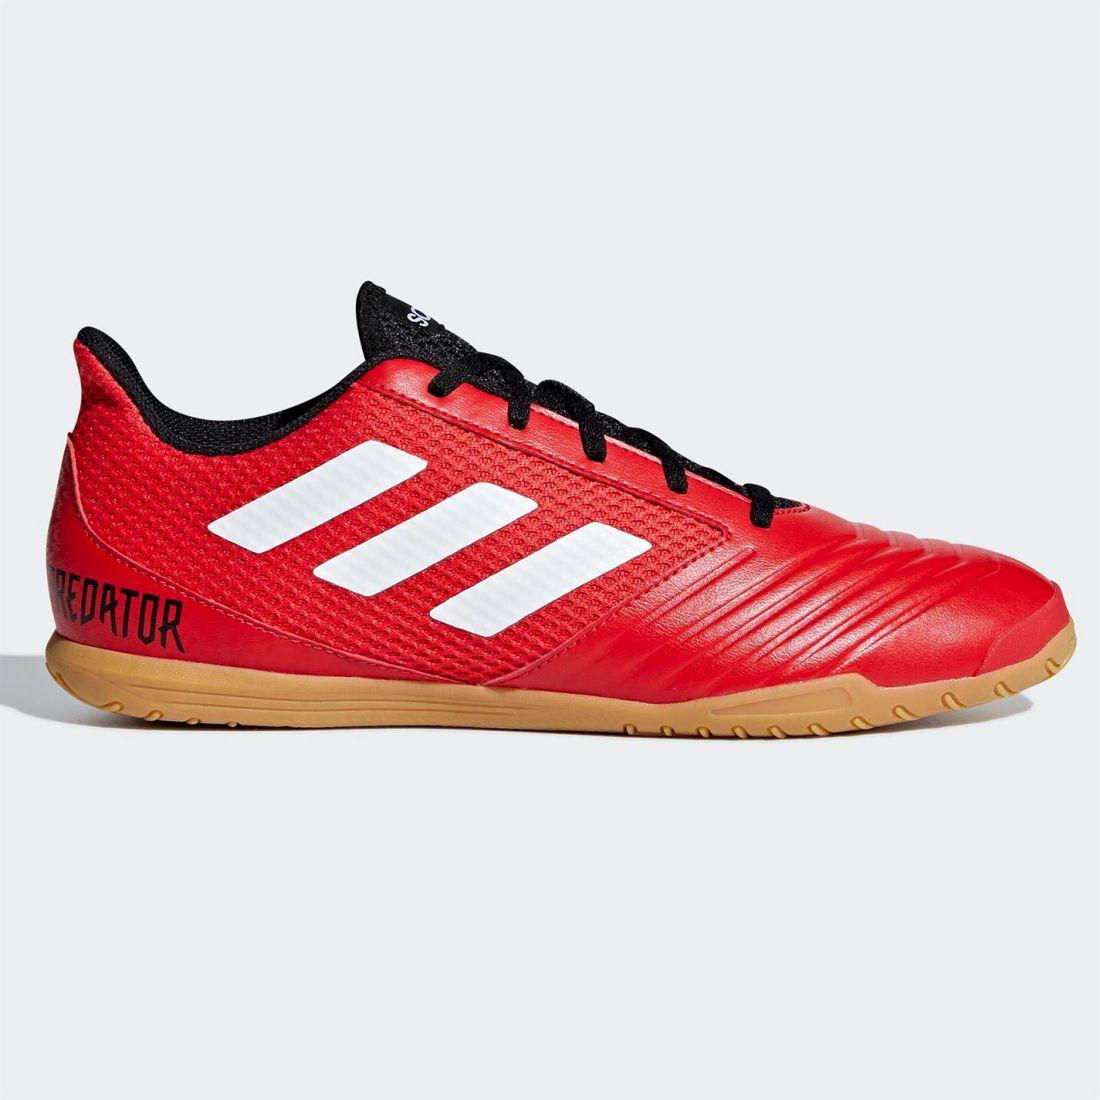 e9decd255 adidas Mens Predator Tango 18.4 Sala Indoor Football Trainers Boots ...